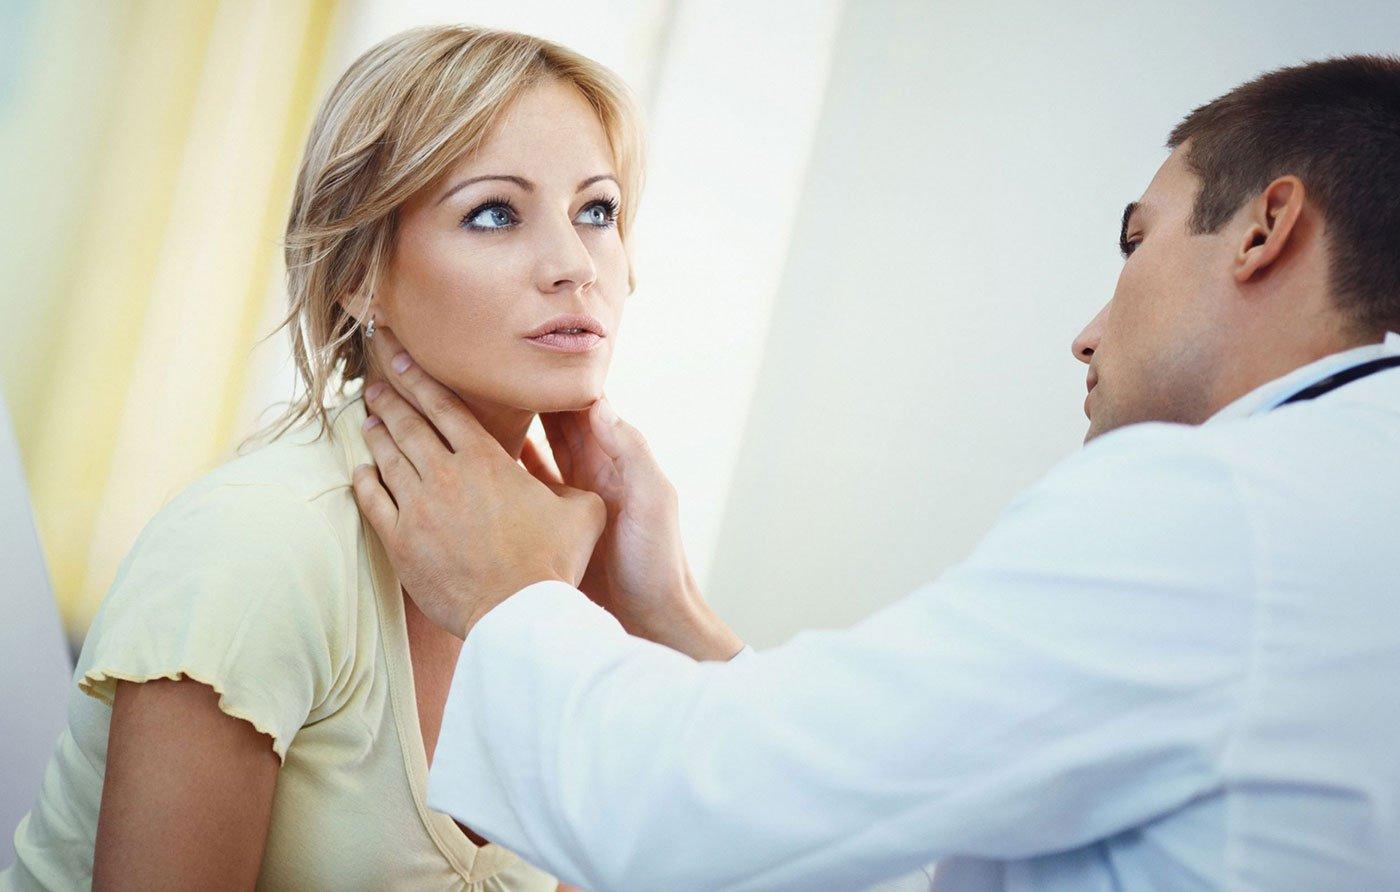 Pregled lekara opste prakse